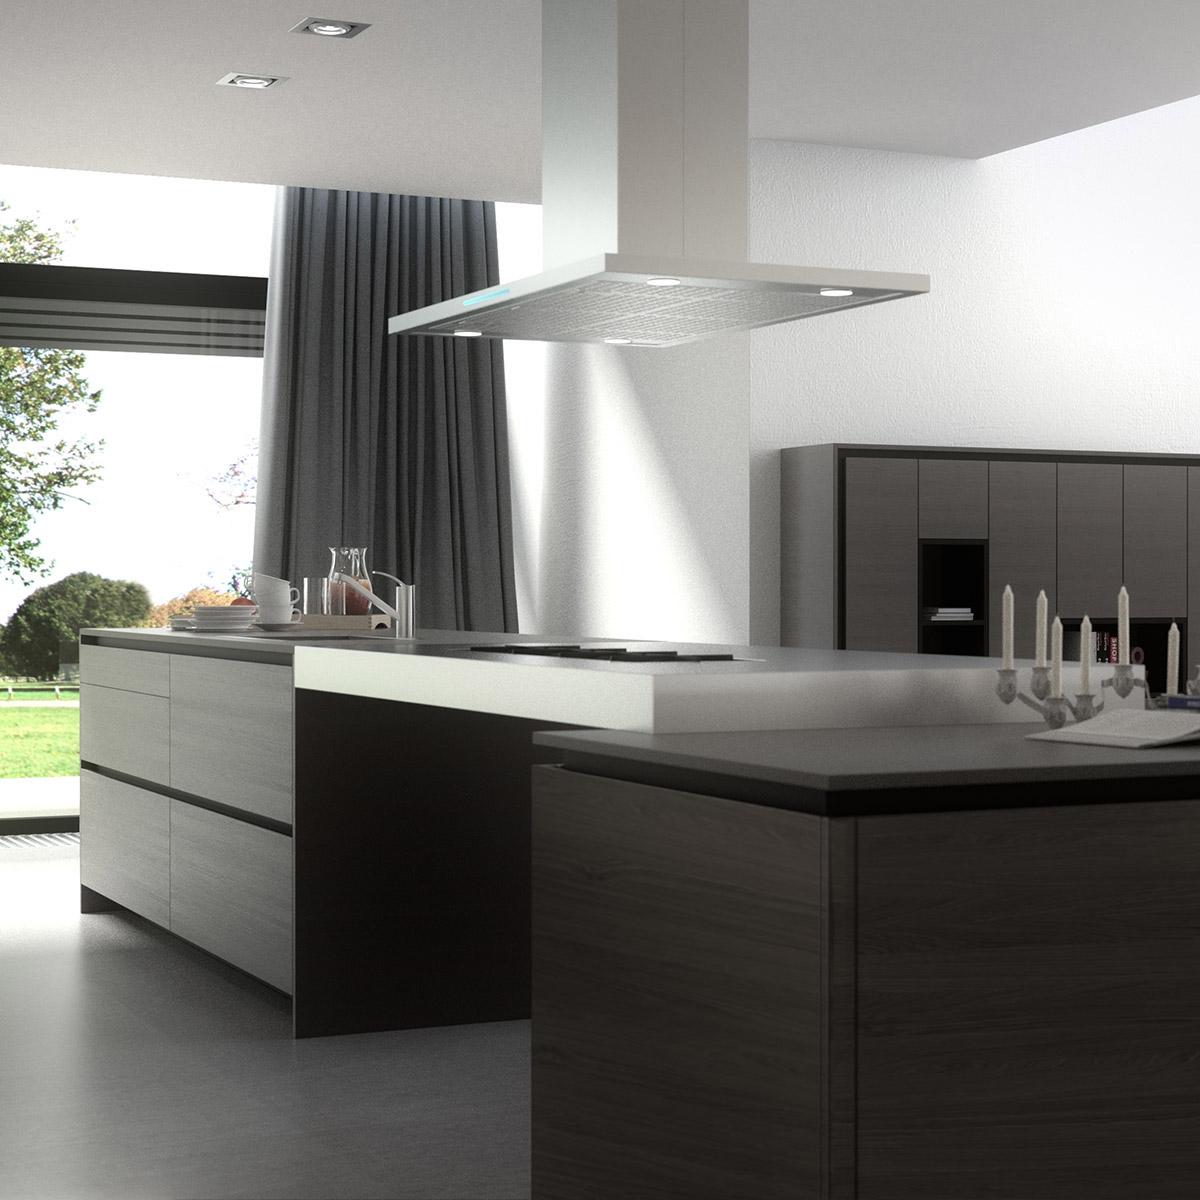 ambitcuines-natura-muebles-de-cocina-05